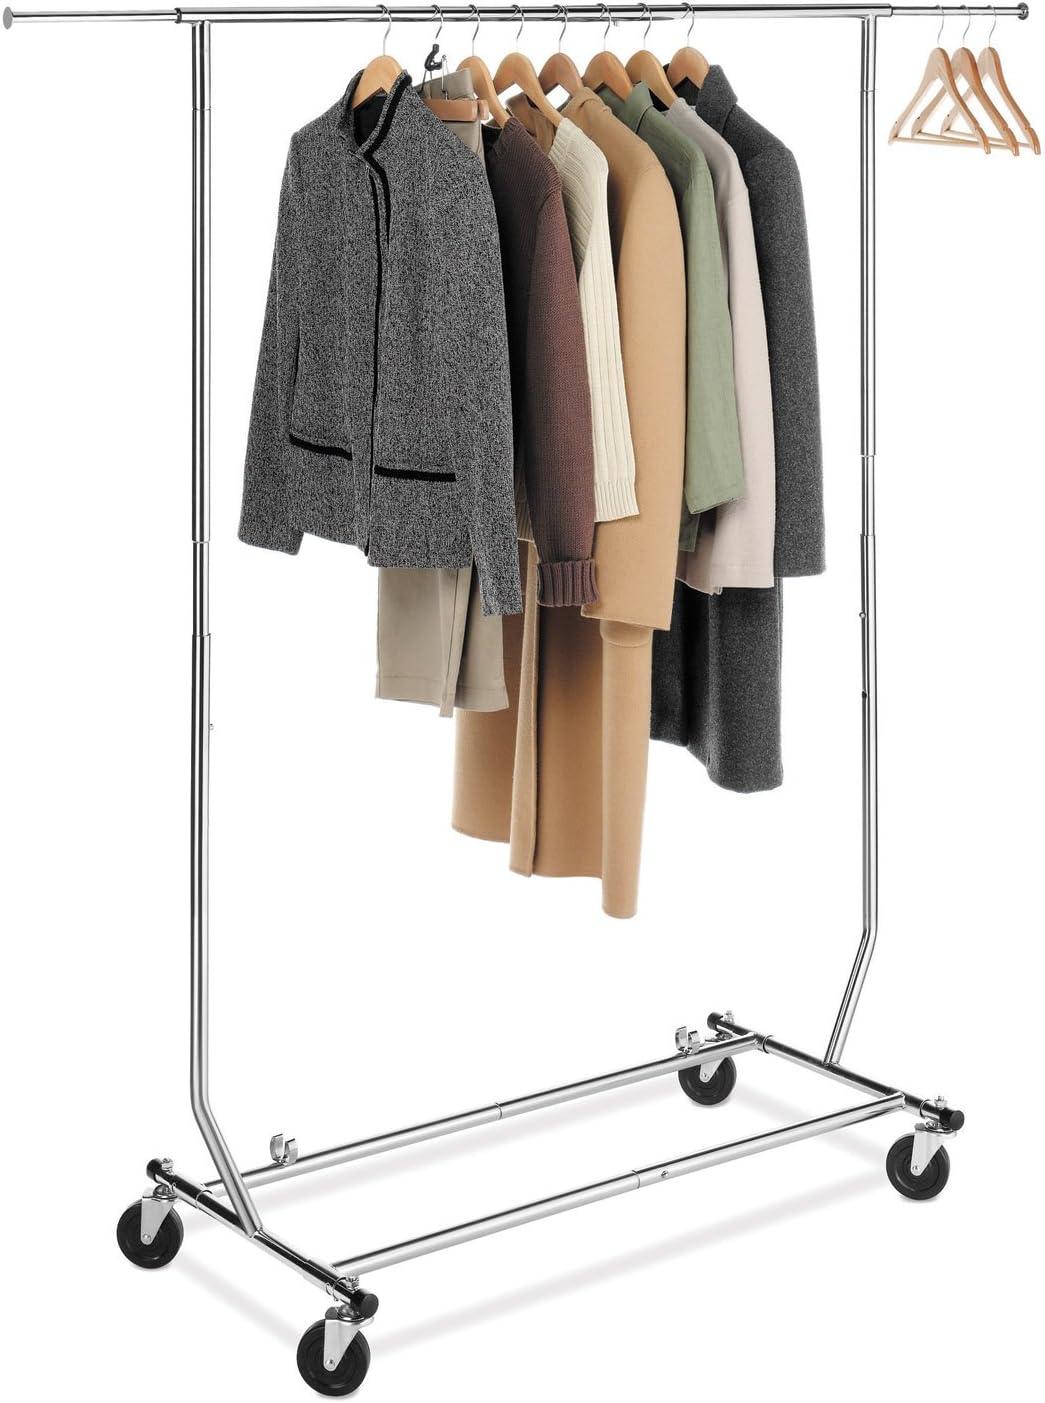 Whitmor Adjustable Rolling Garment Rack Collapsible Chrome